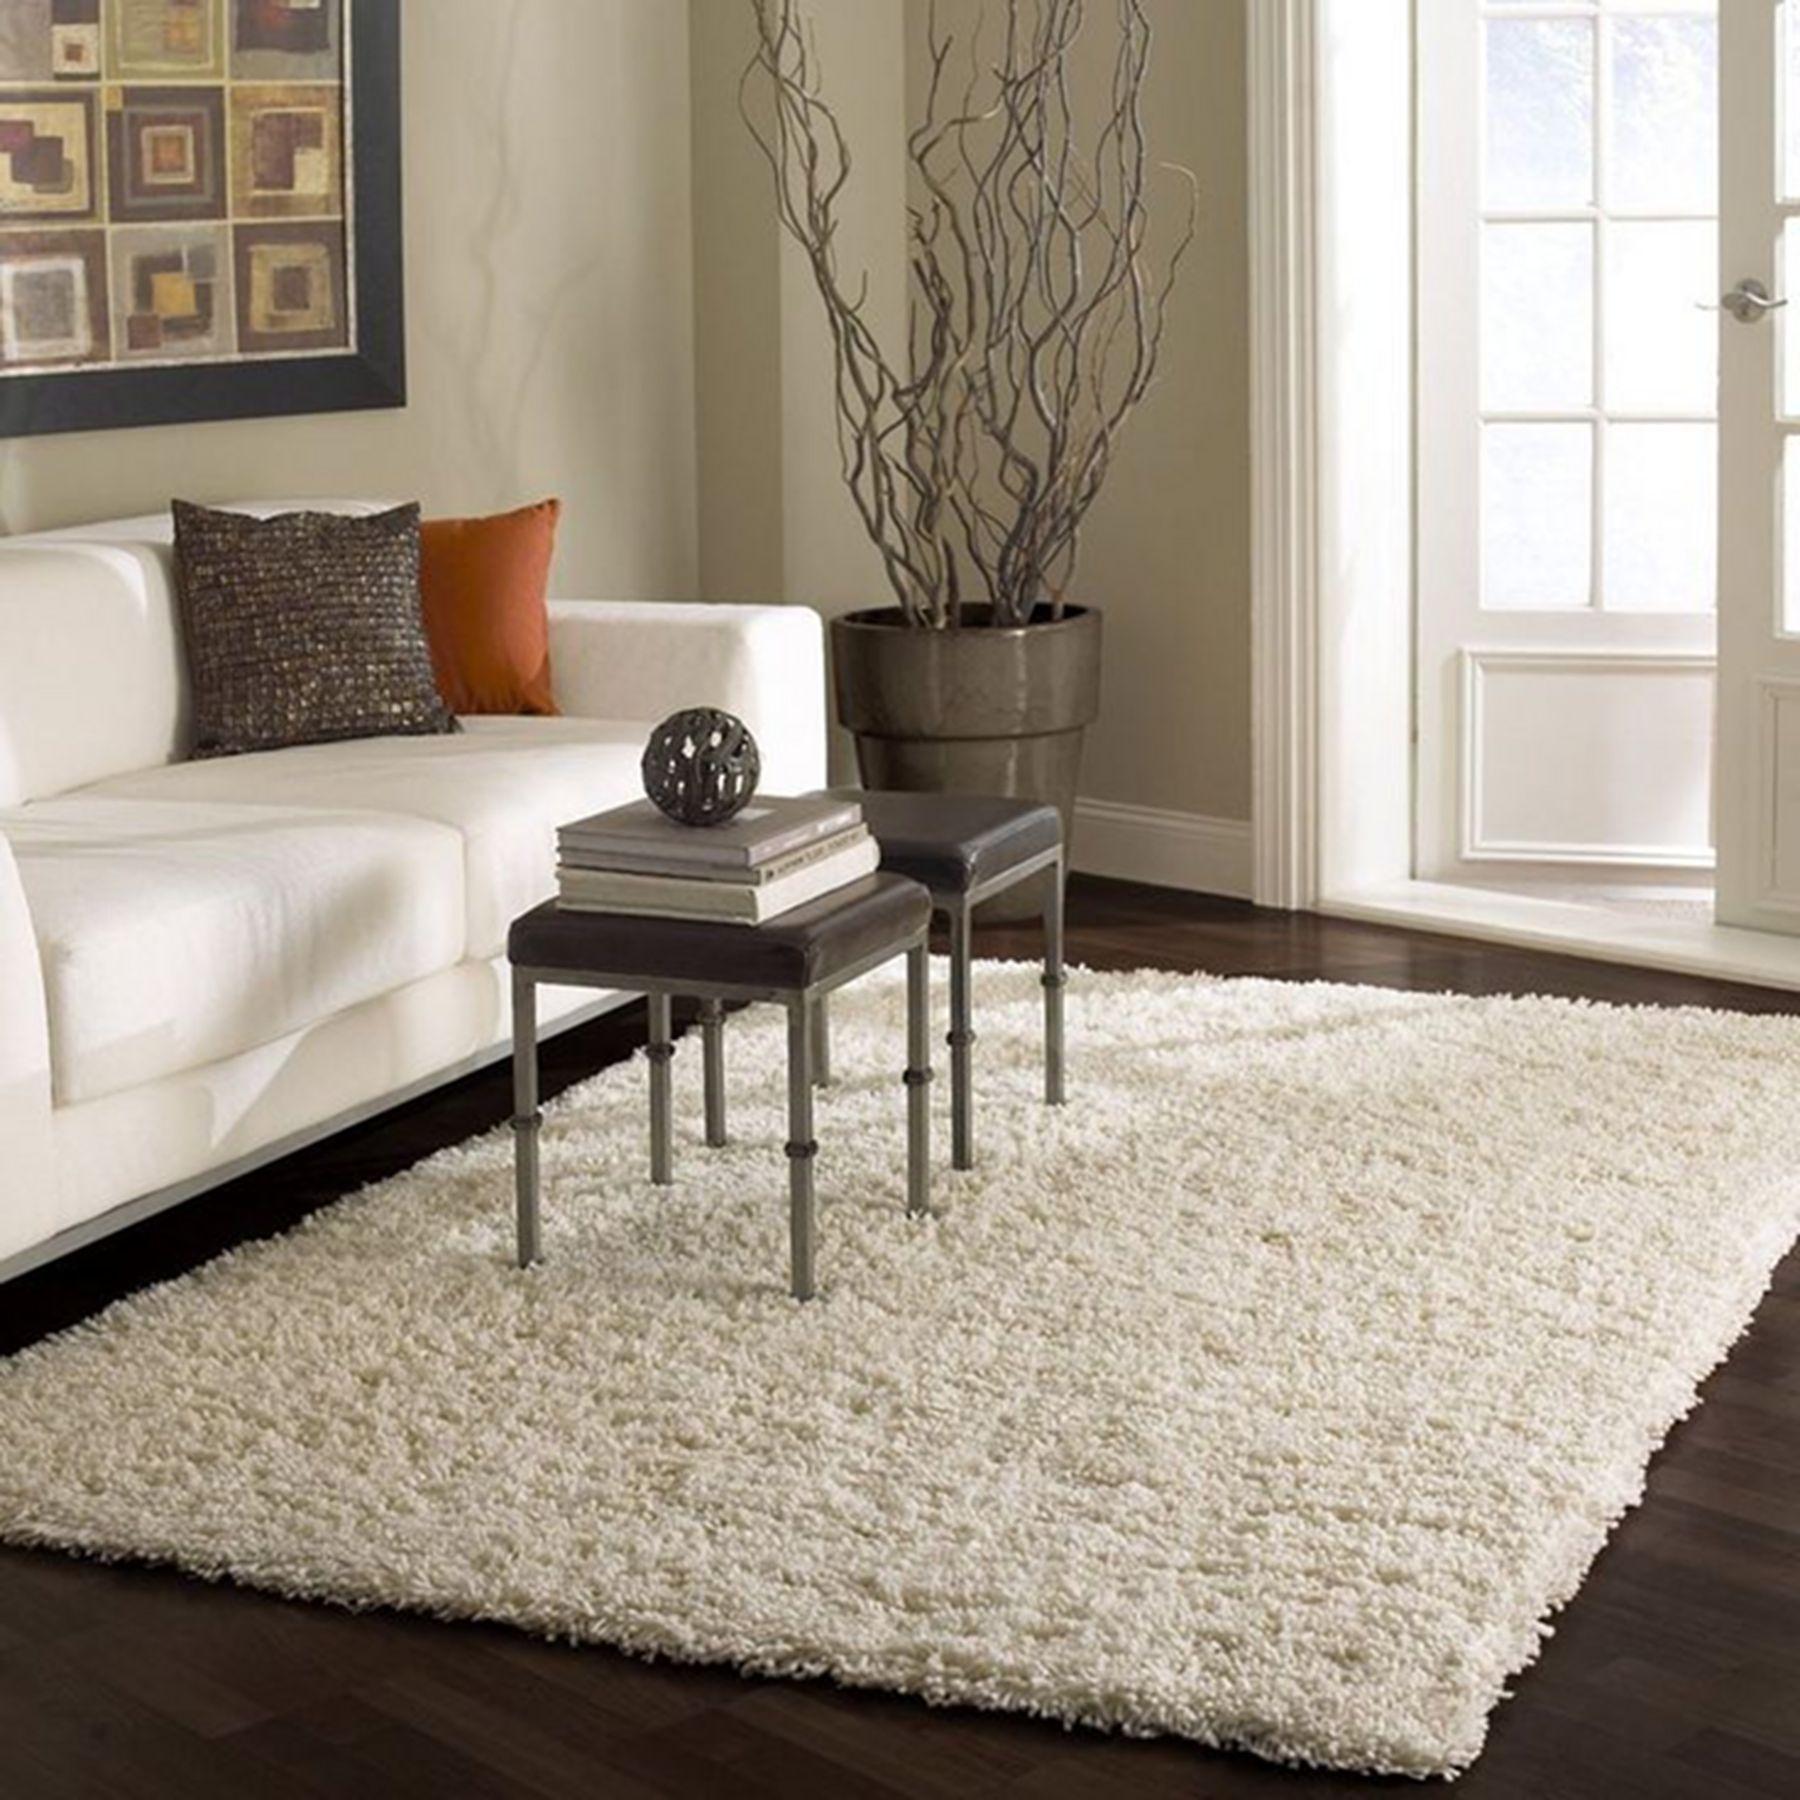 12 Interesting Carpet Design Idea For Your Living Room Carpetdesign Carpetideas Livingro In 2020 Cheap Living Room Furniture Living Room Carpet Rugs In Living Room